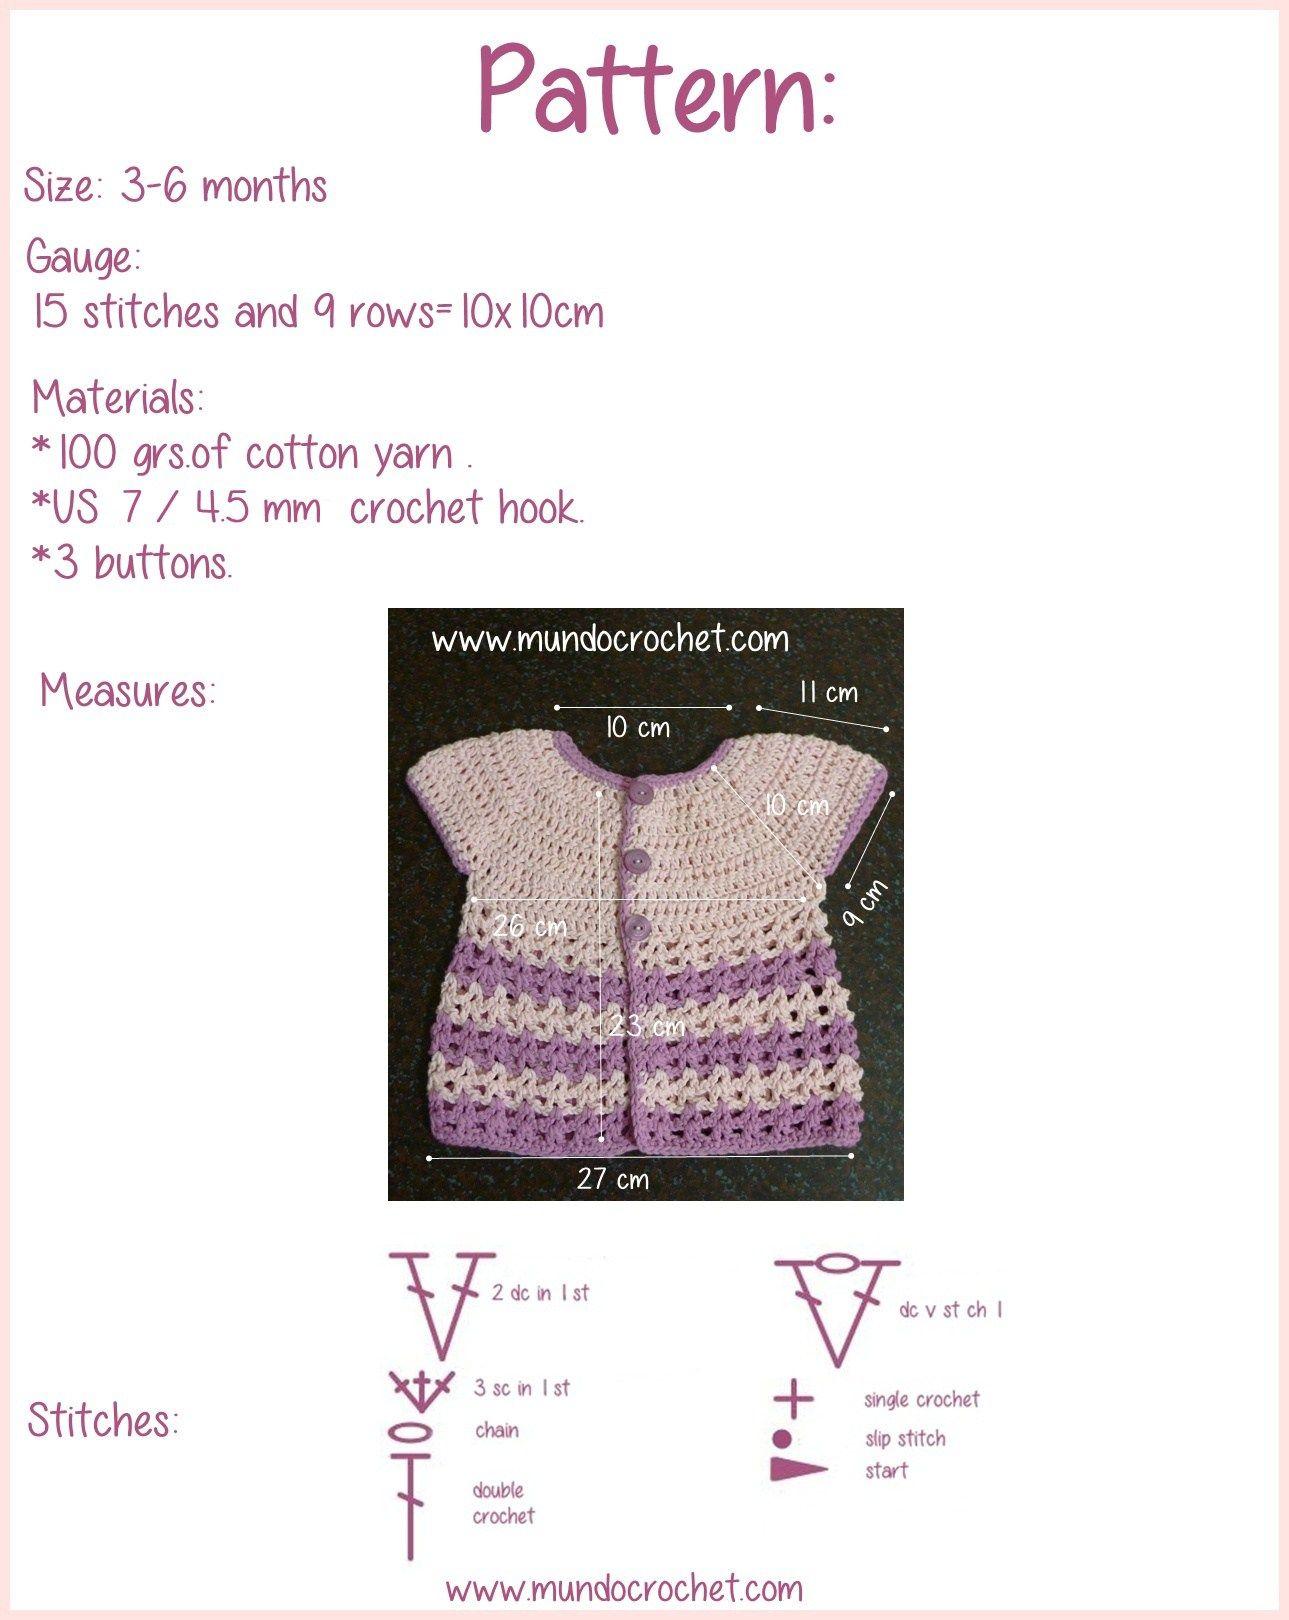 Round yoke baby crochet cardigan free pattern and tutorial2 | Croché ...